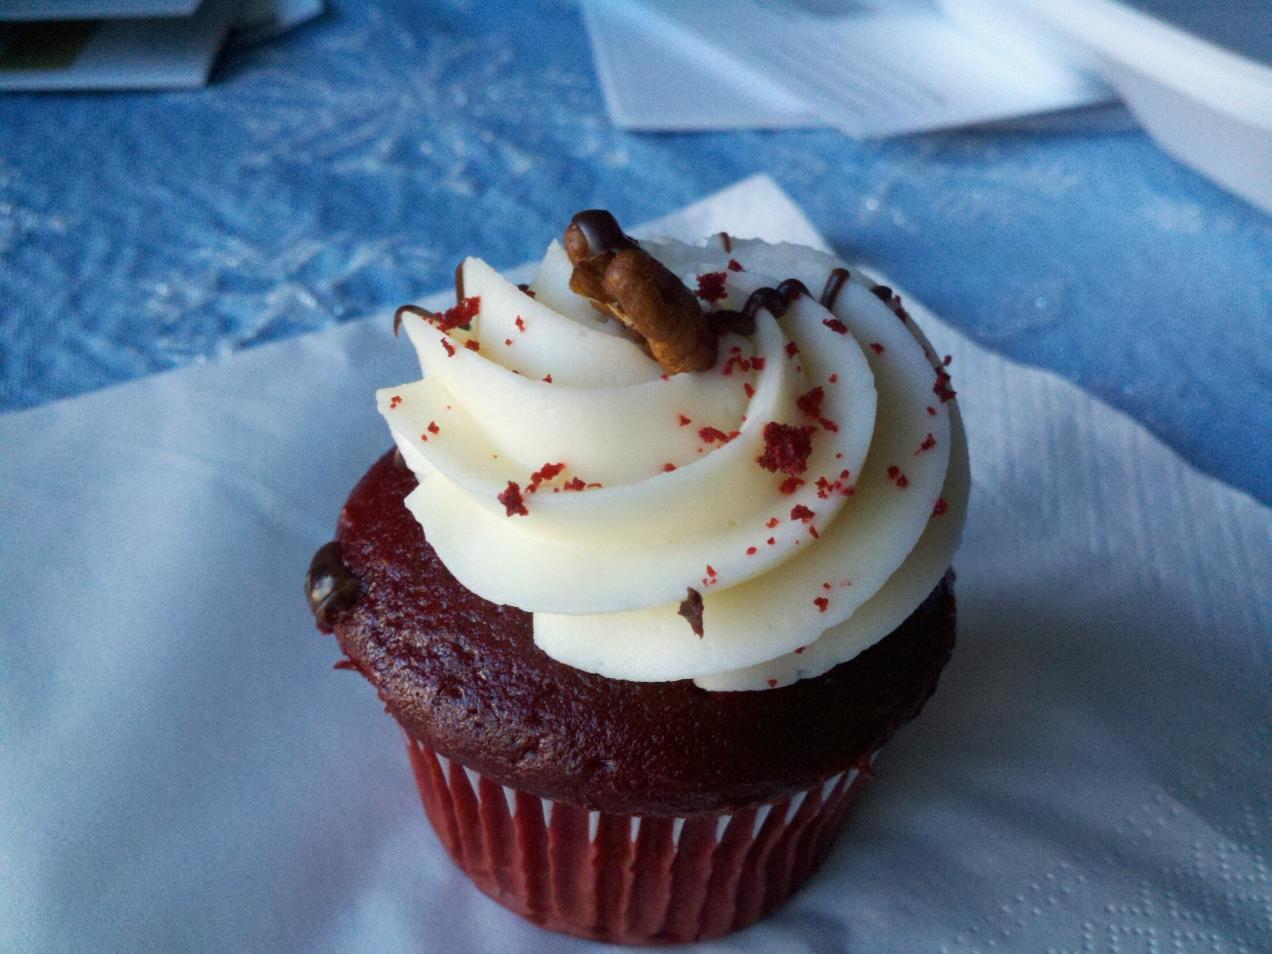 A Cupcake from Hoboken